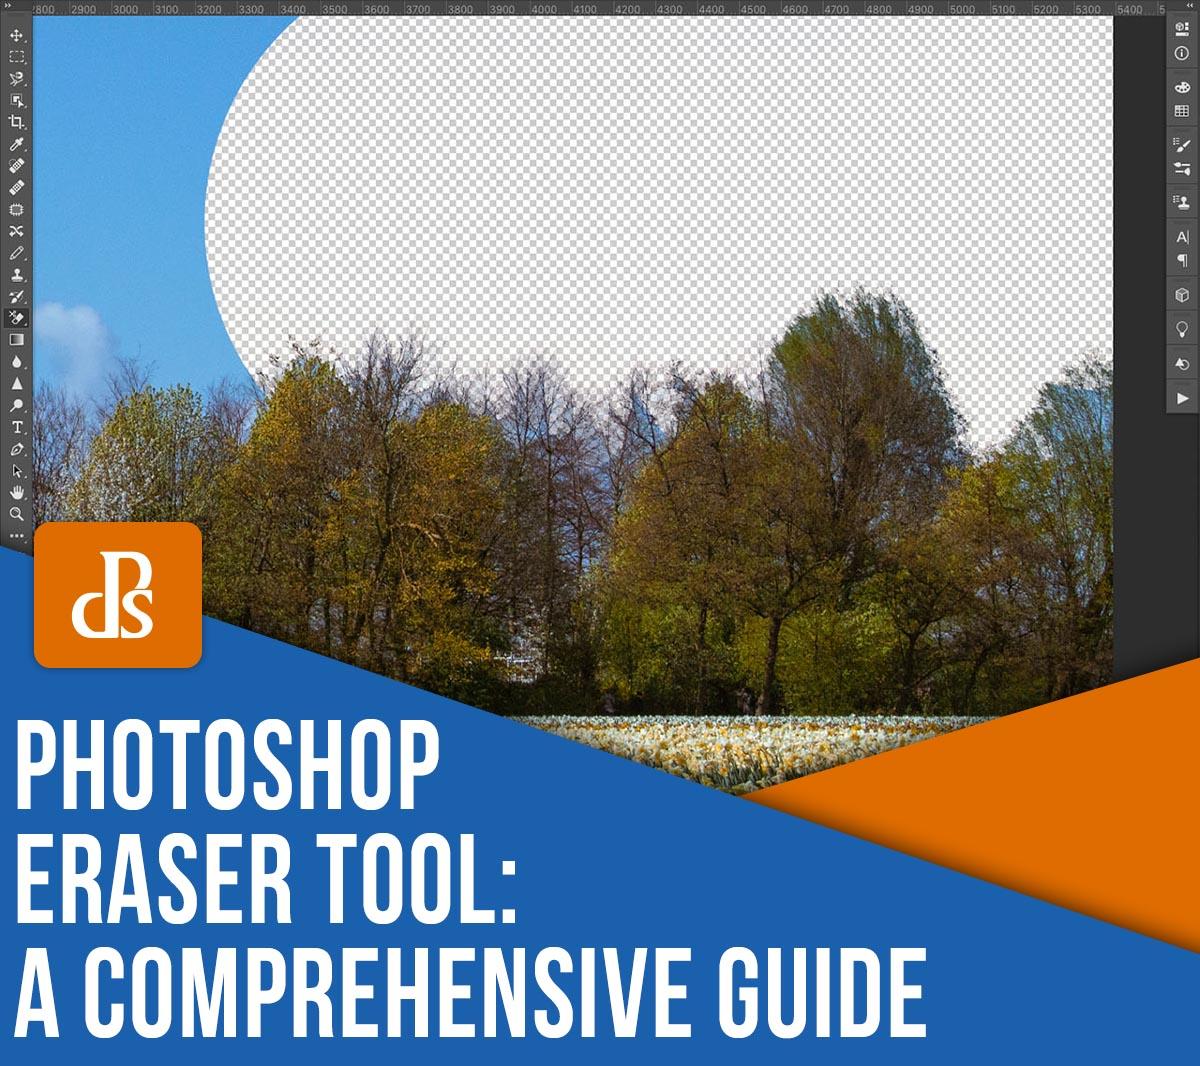 Photoshop Eraser Tool: a comprehensive guide